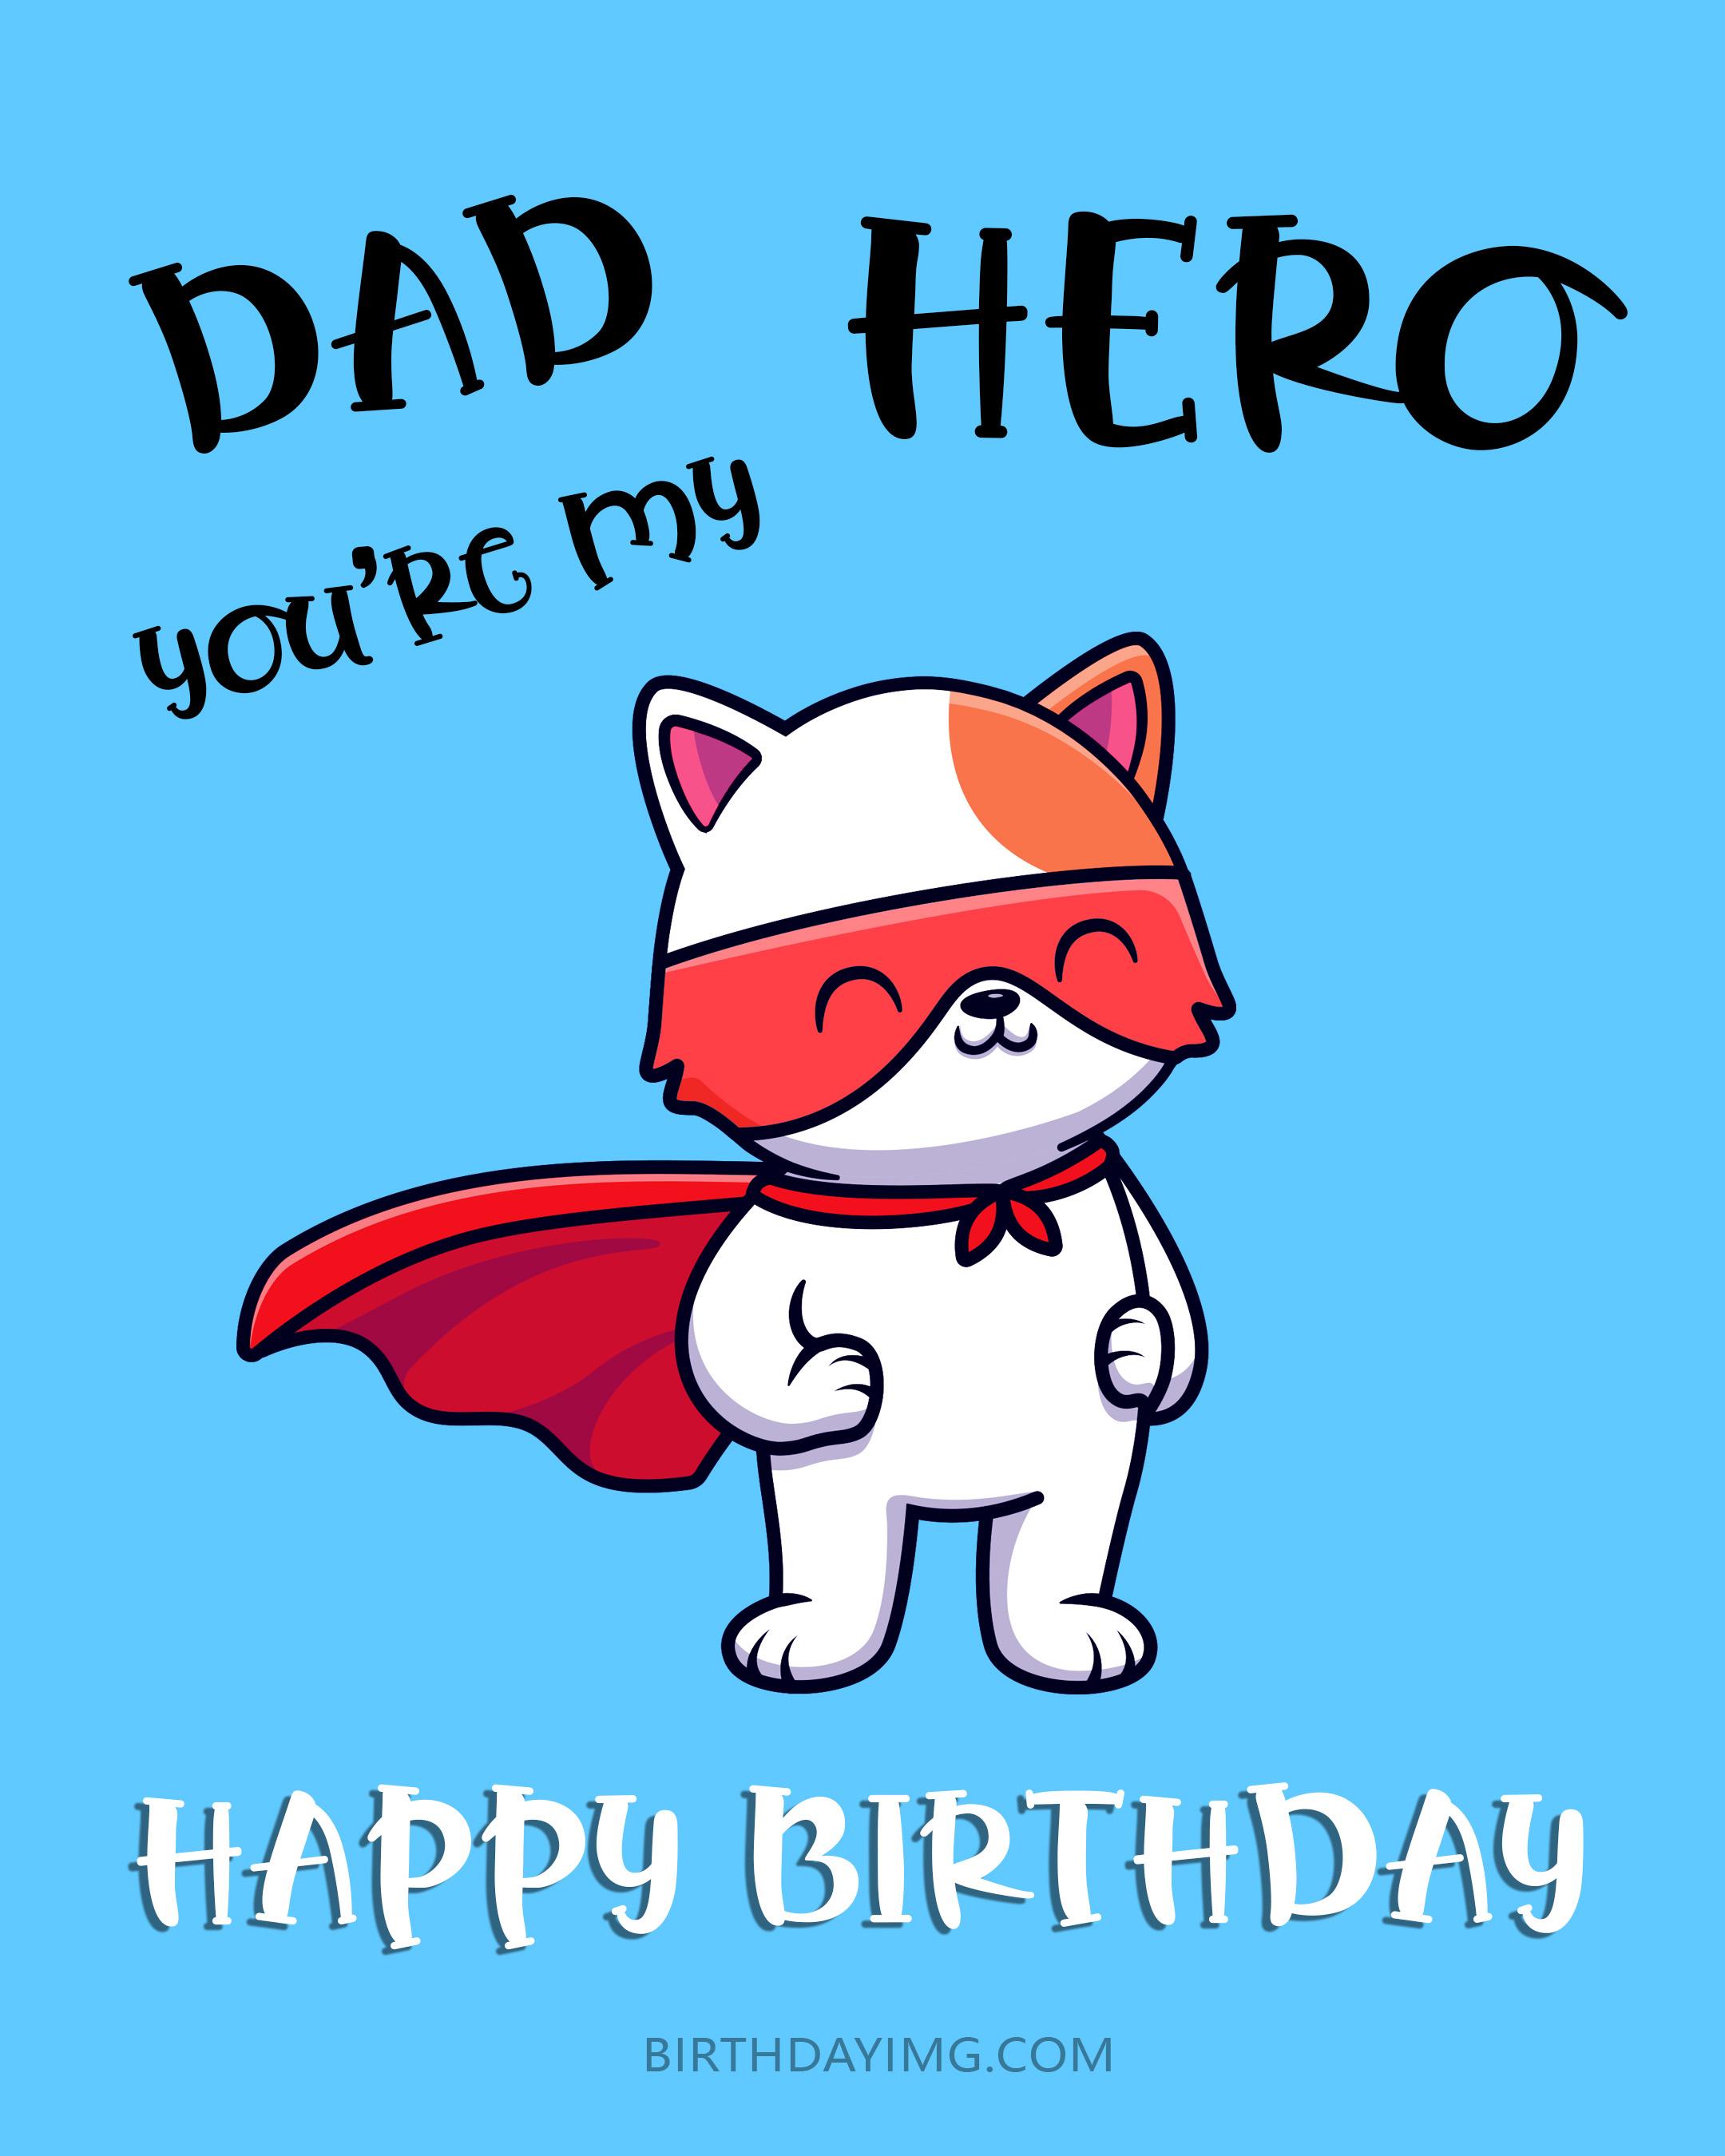 Free Happy Birthday Image For Dad With Super Cat - birthdayimg.com